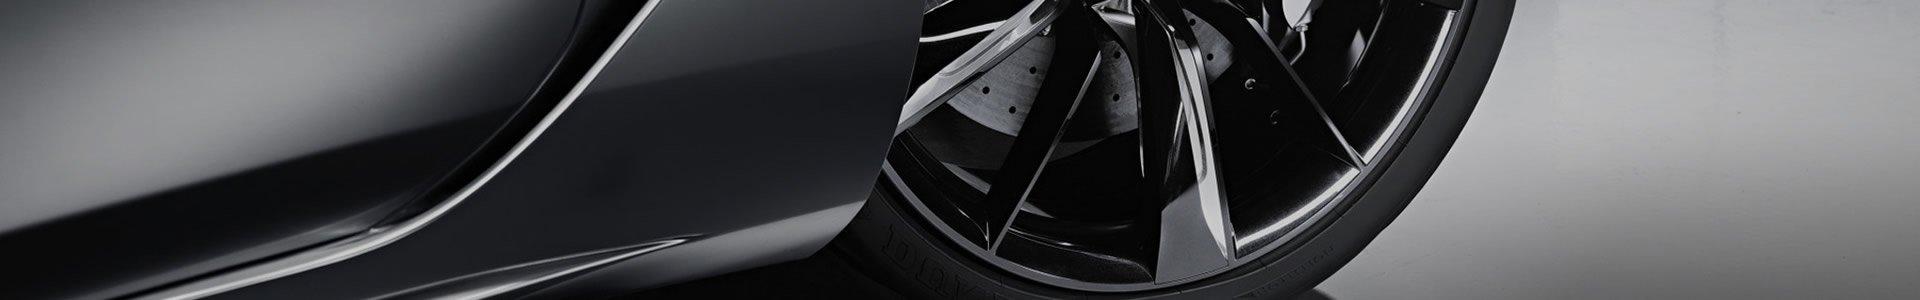 Tuowei CNC Rapid Prototype Aluminum Alloy Prototype image7